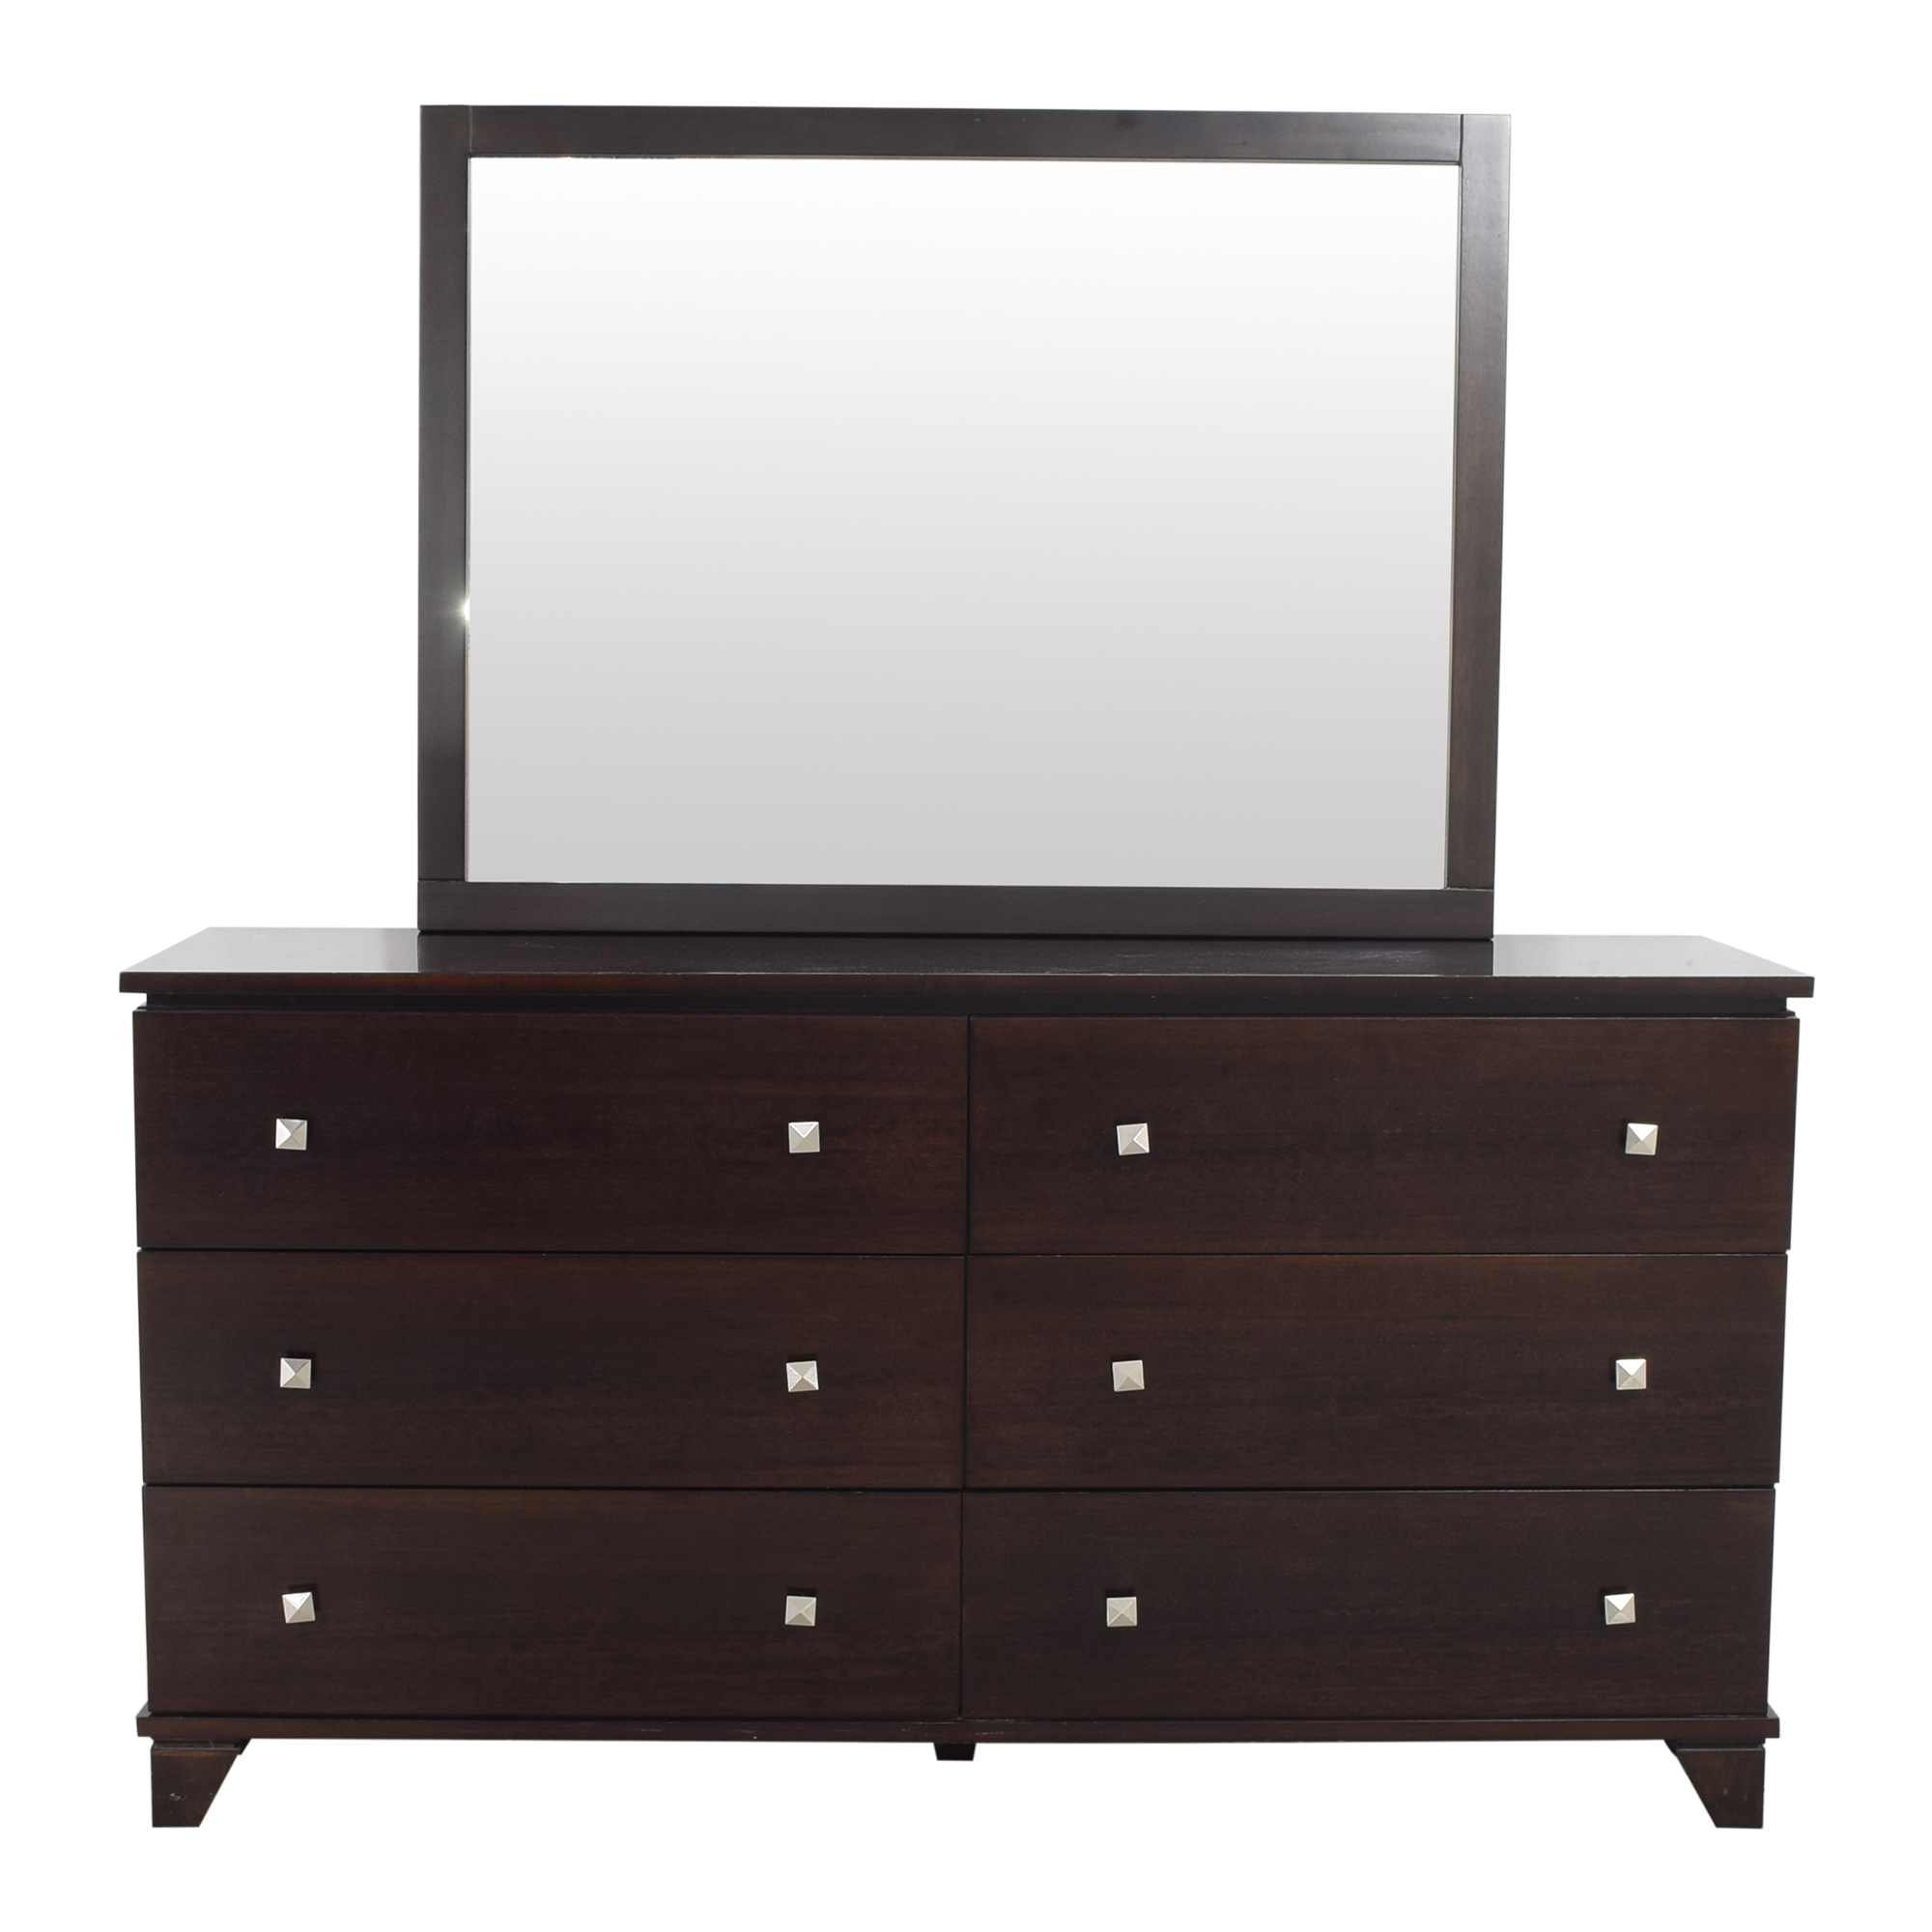 Ligna Furniture Ligna Furniture Double Dresser with Mirror second hand